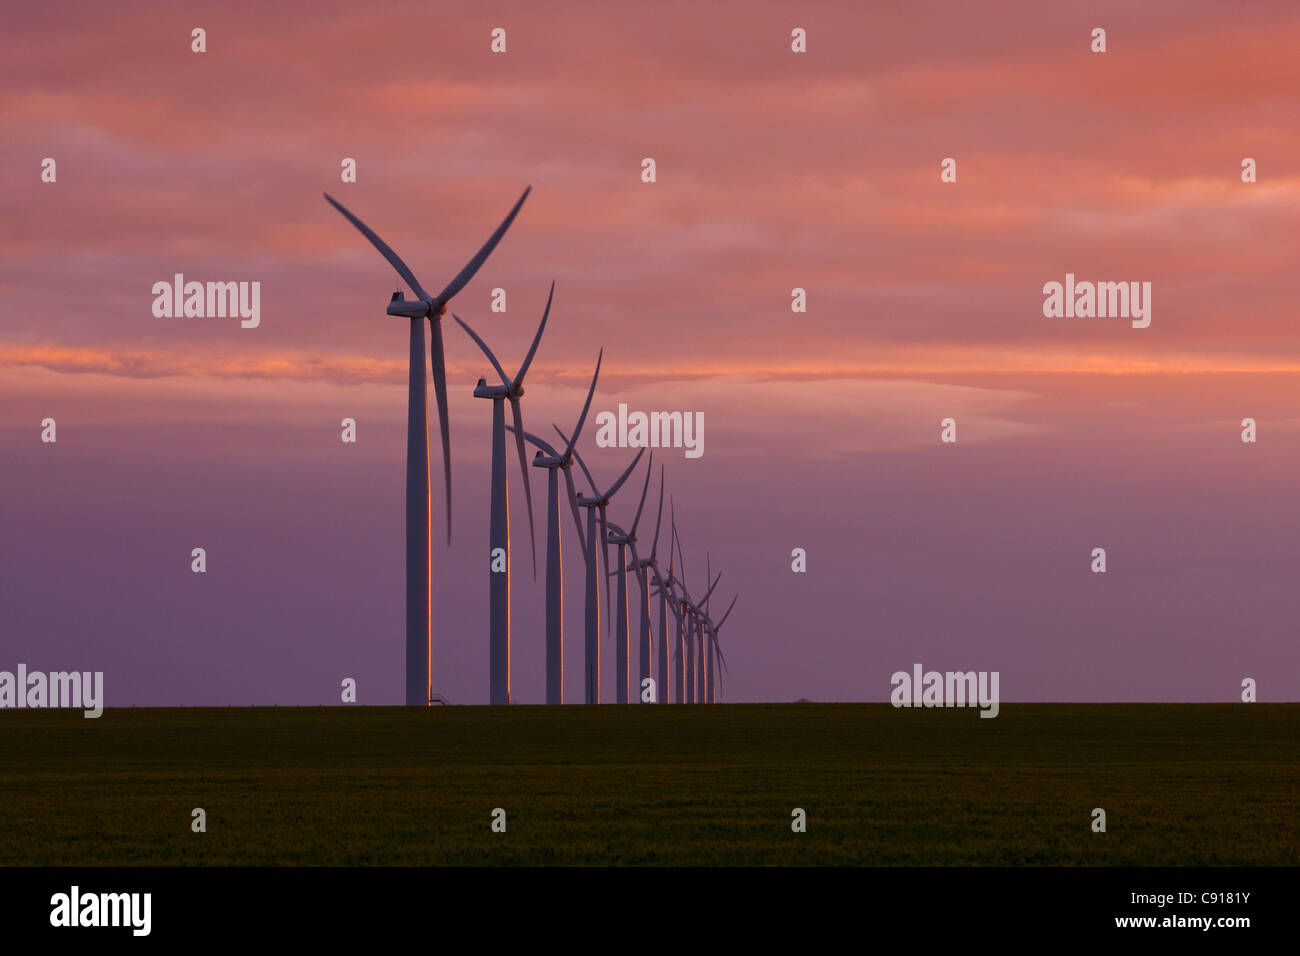 Wind turbines Fleurieu Peninsula South Australia - Stock Image